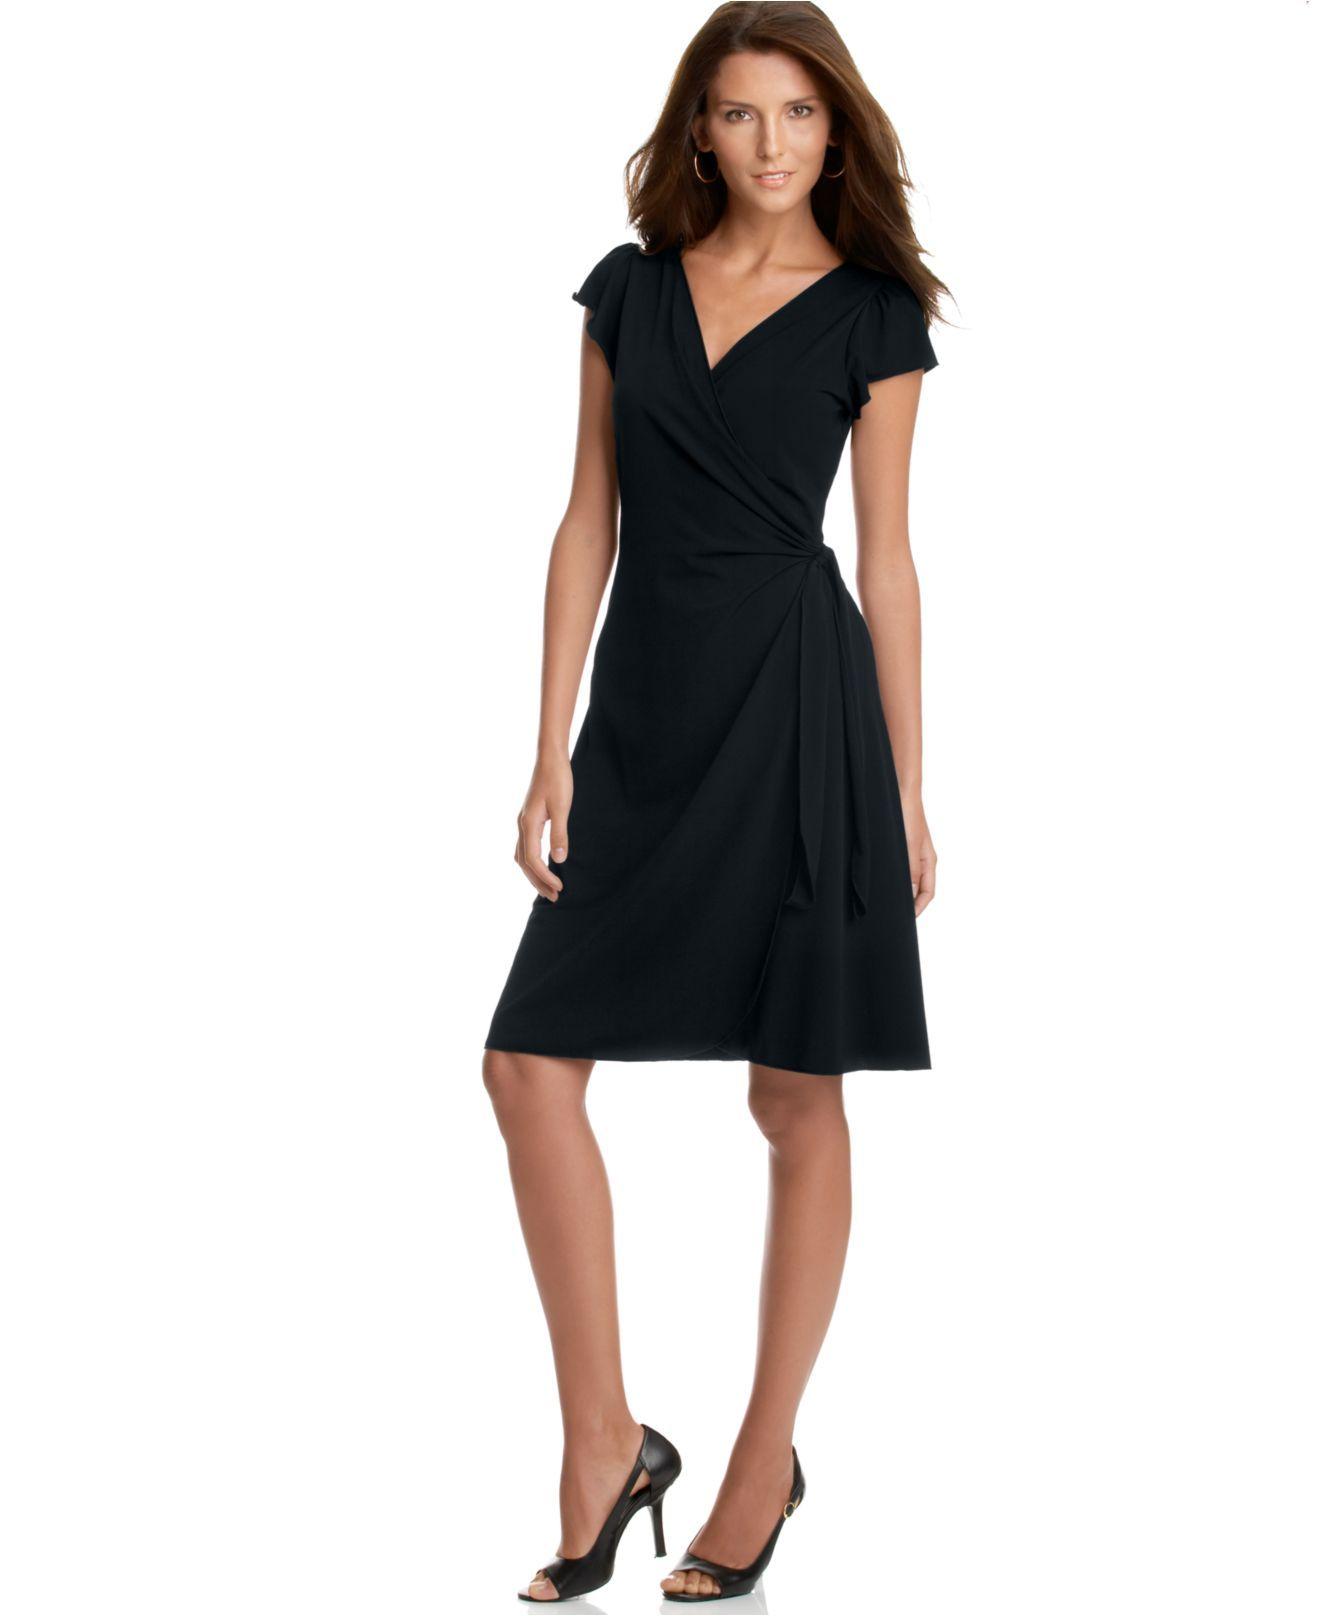 Lace dress macys  Studio M Dress Flutter Sleeve Matte Jersey Wrap Cocktail Dress